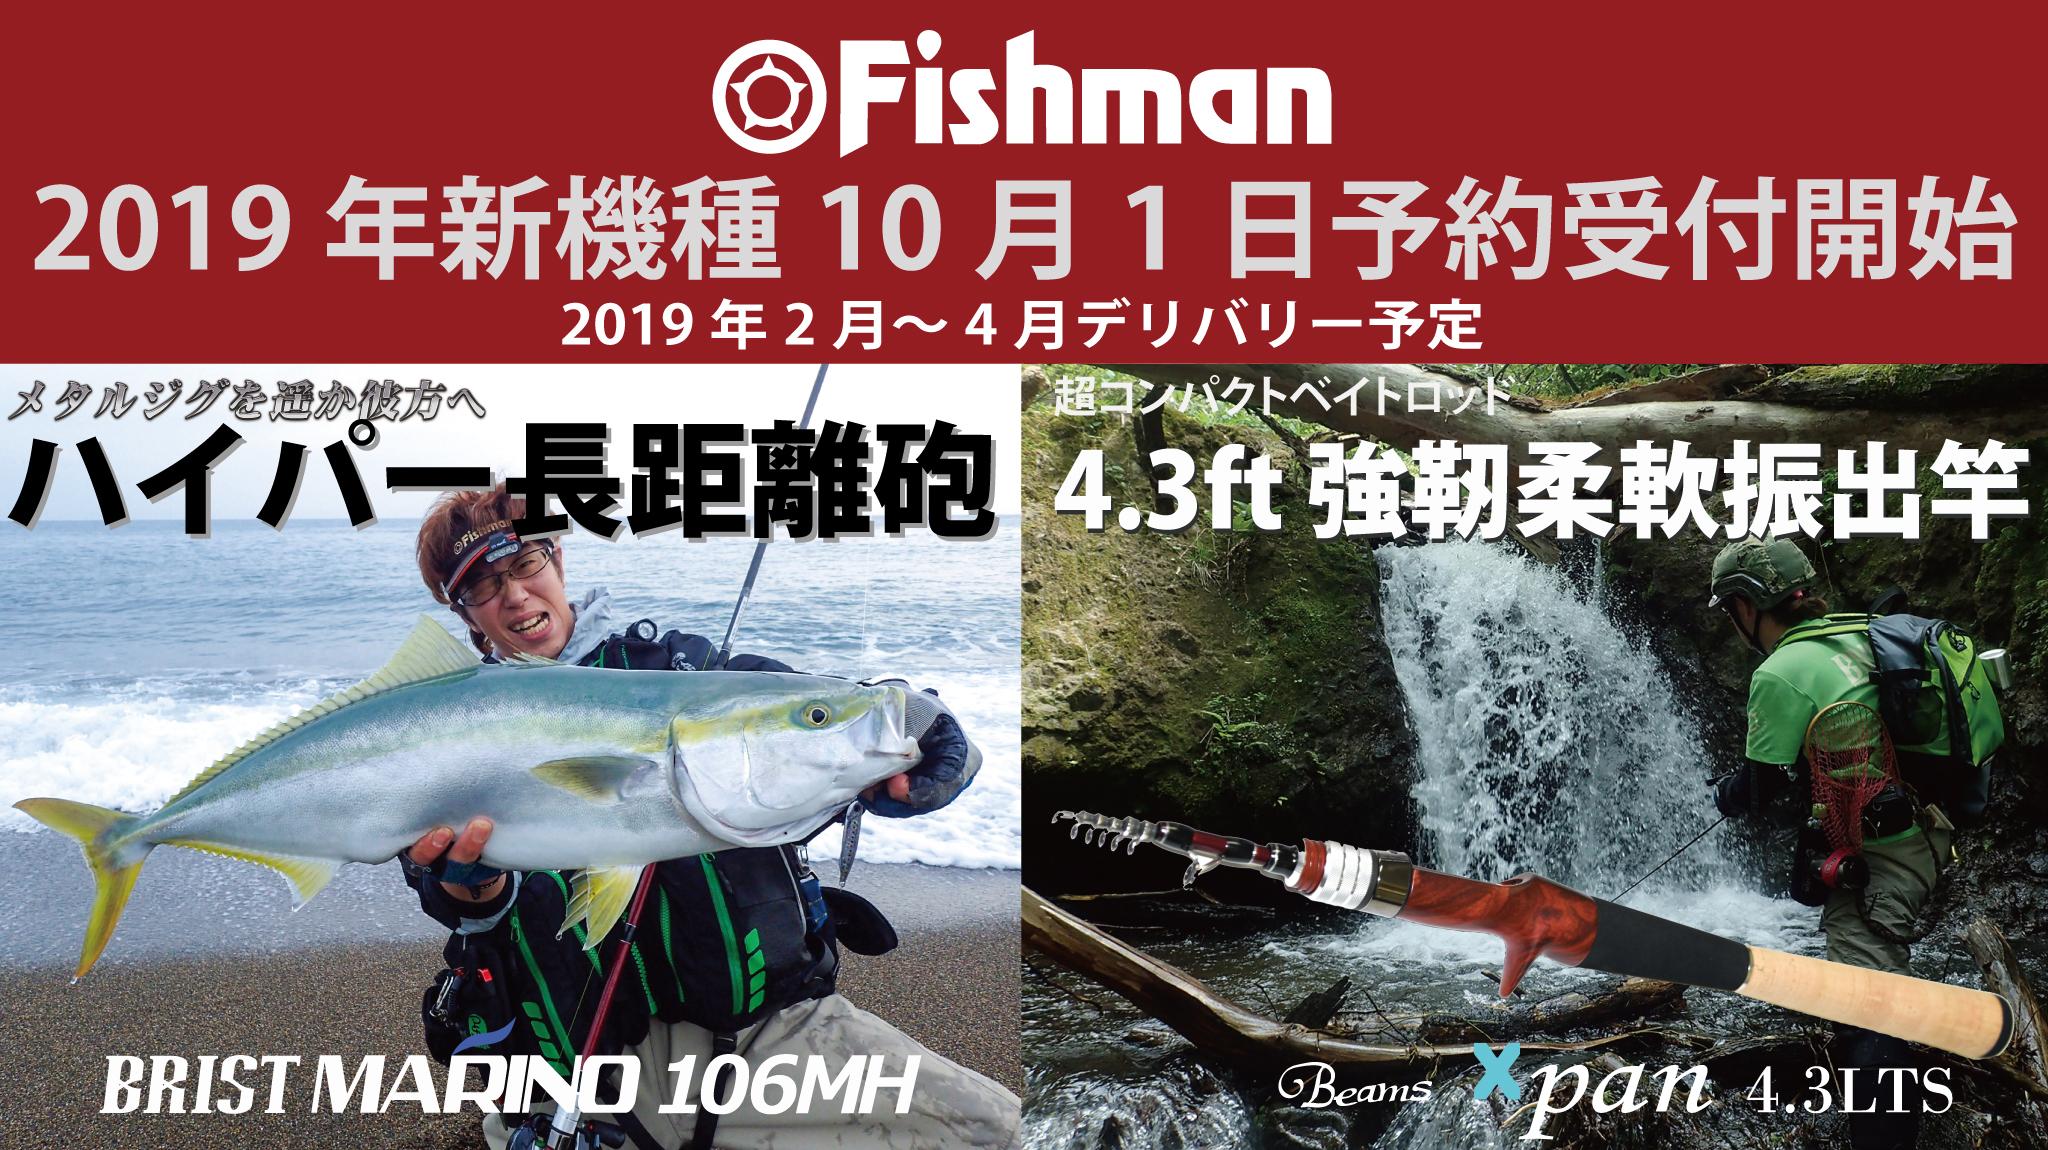 2019年 Fishman 新製品情報公開!!